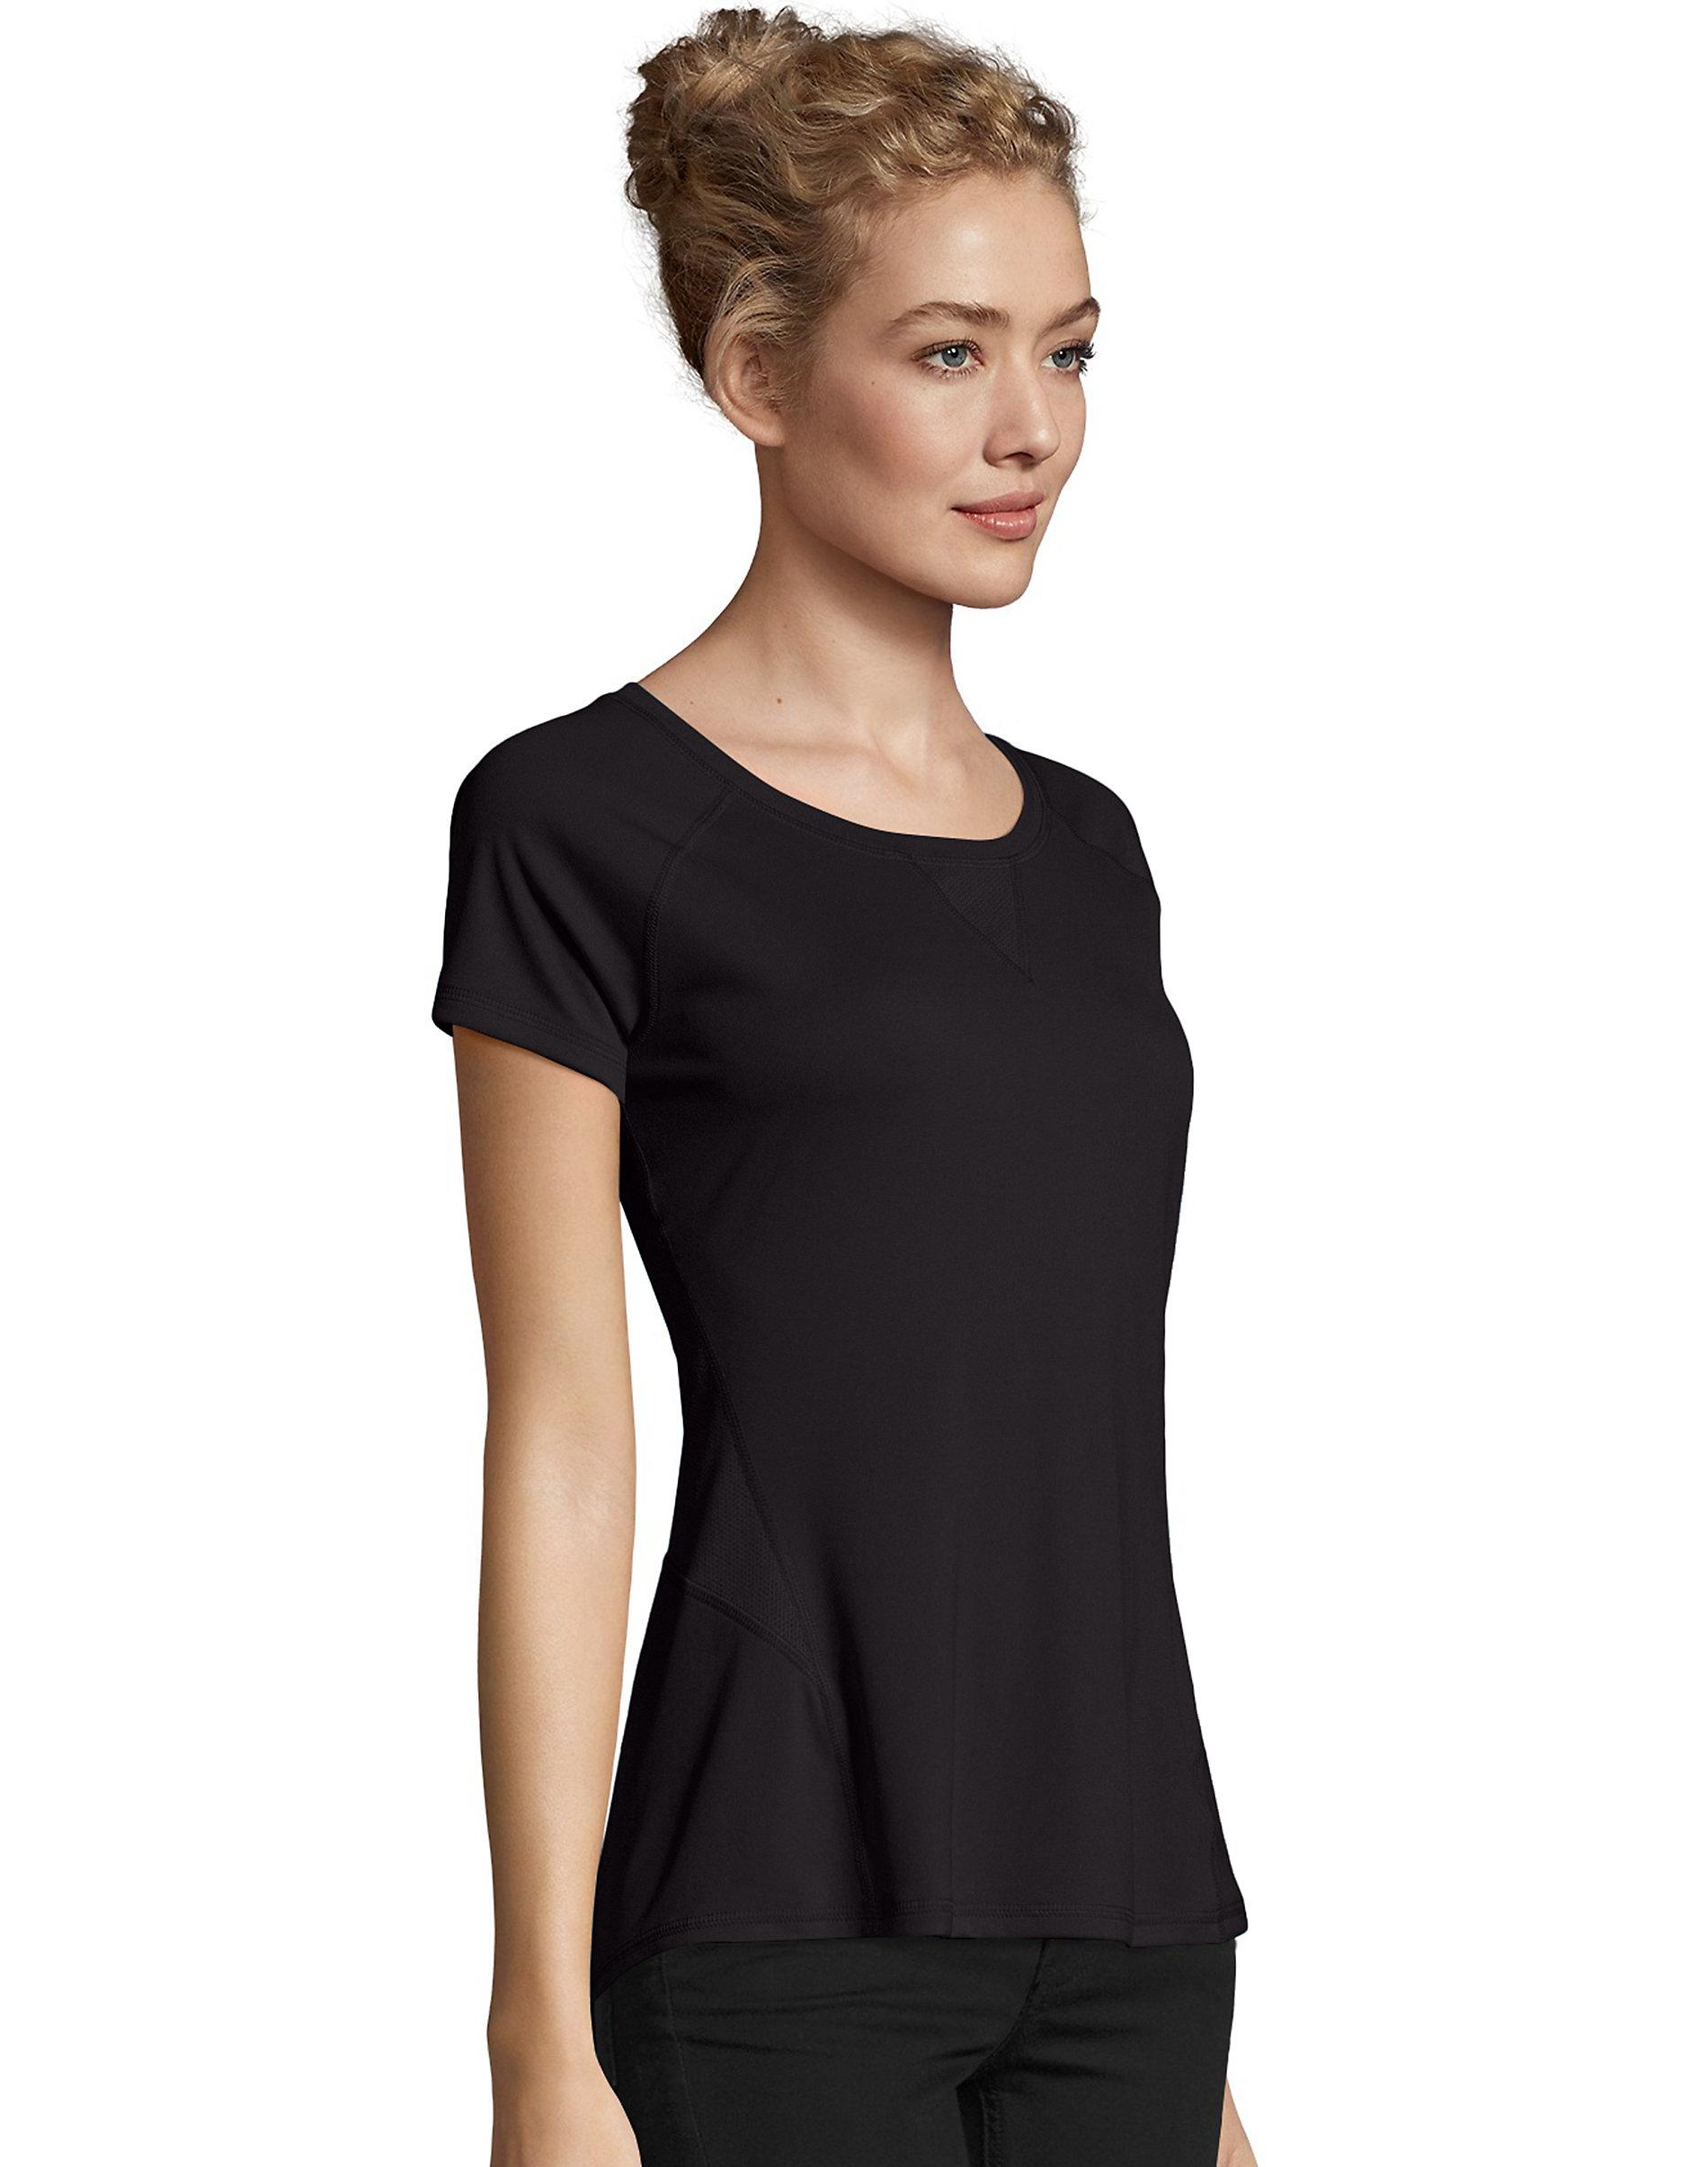 Hanes-Women-039-s-Tee-Shirt-Mesh-Insets-Performance-Sport-Cool-DRI-Comfort-Pocket thumbnail 2